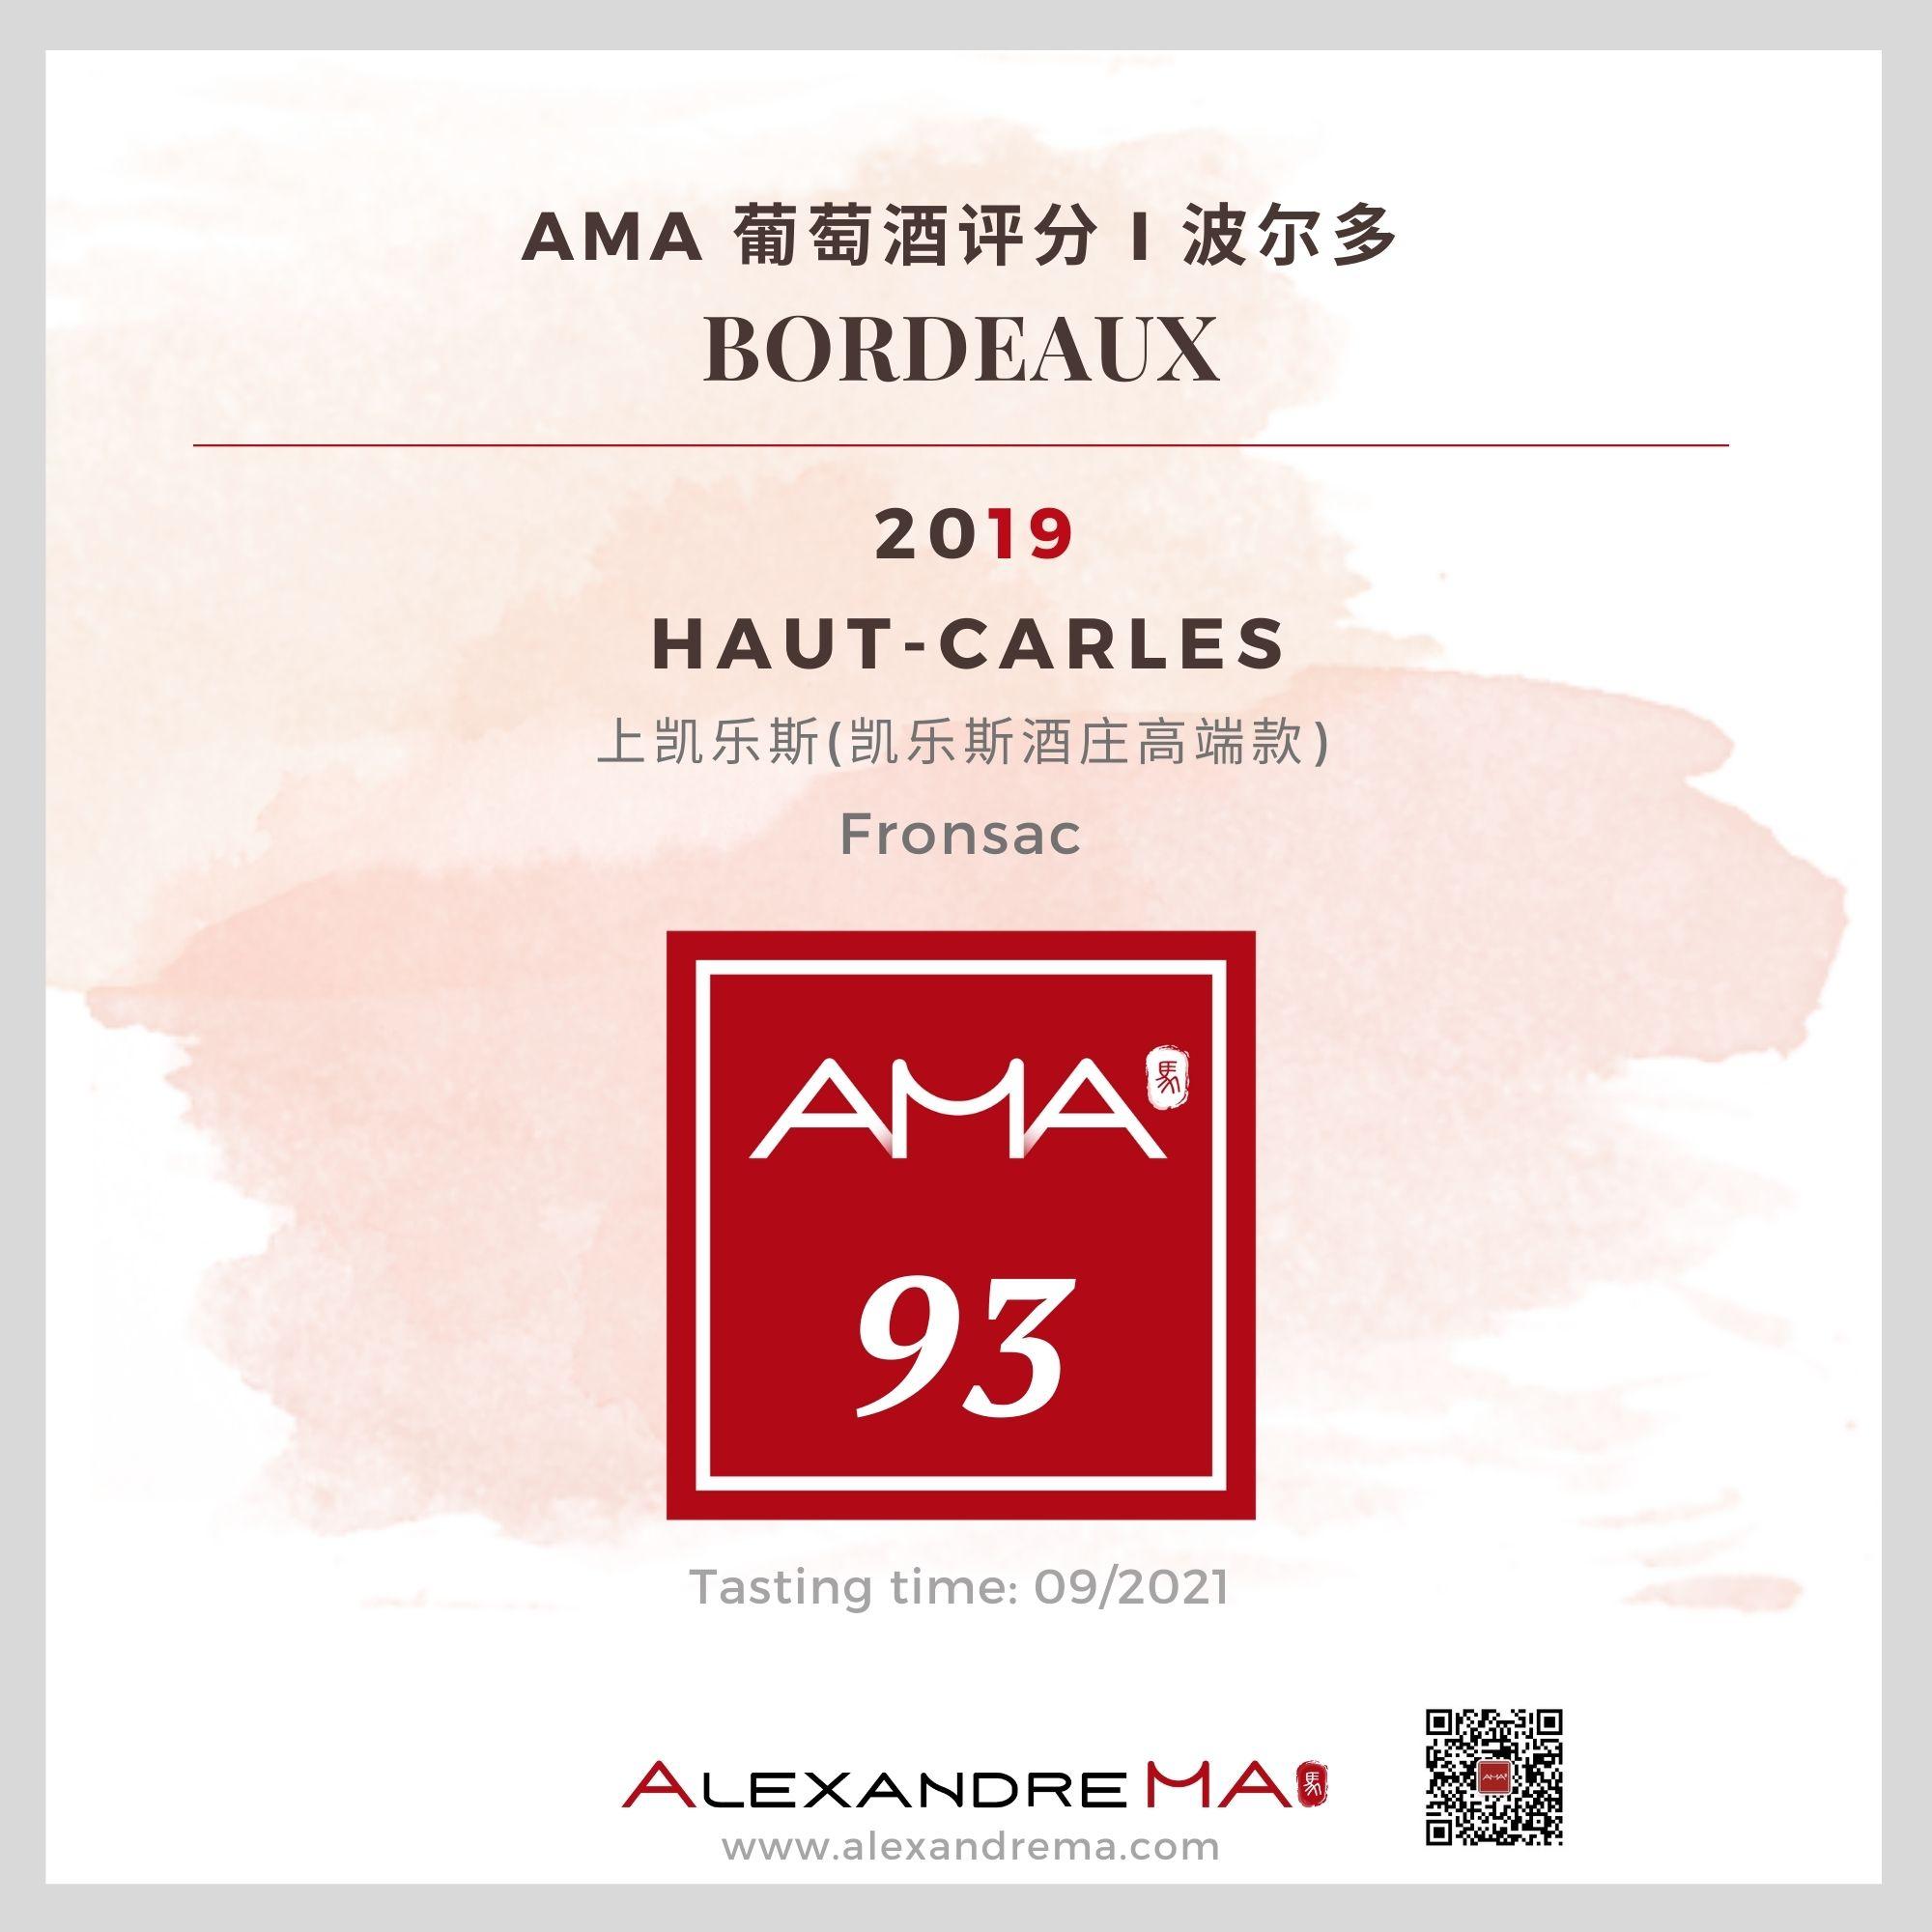 Haut-Carles 2019 上凯乐斯 - Alexandre Ma